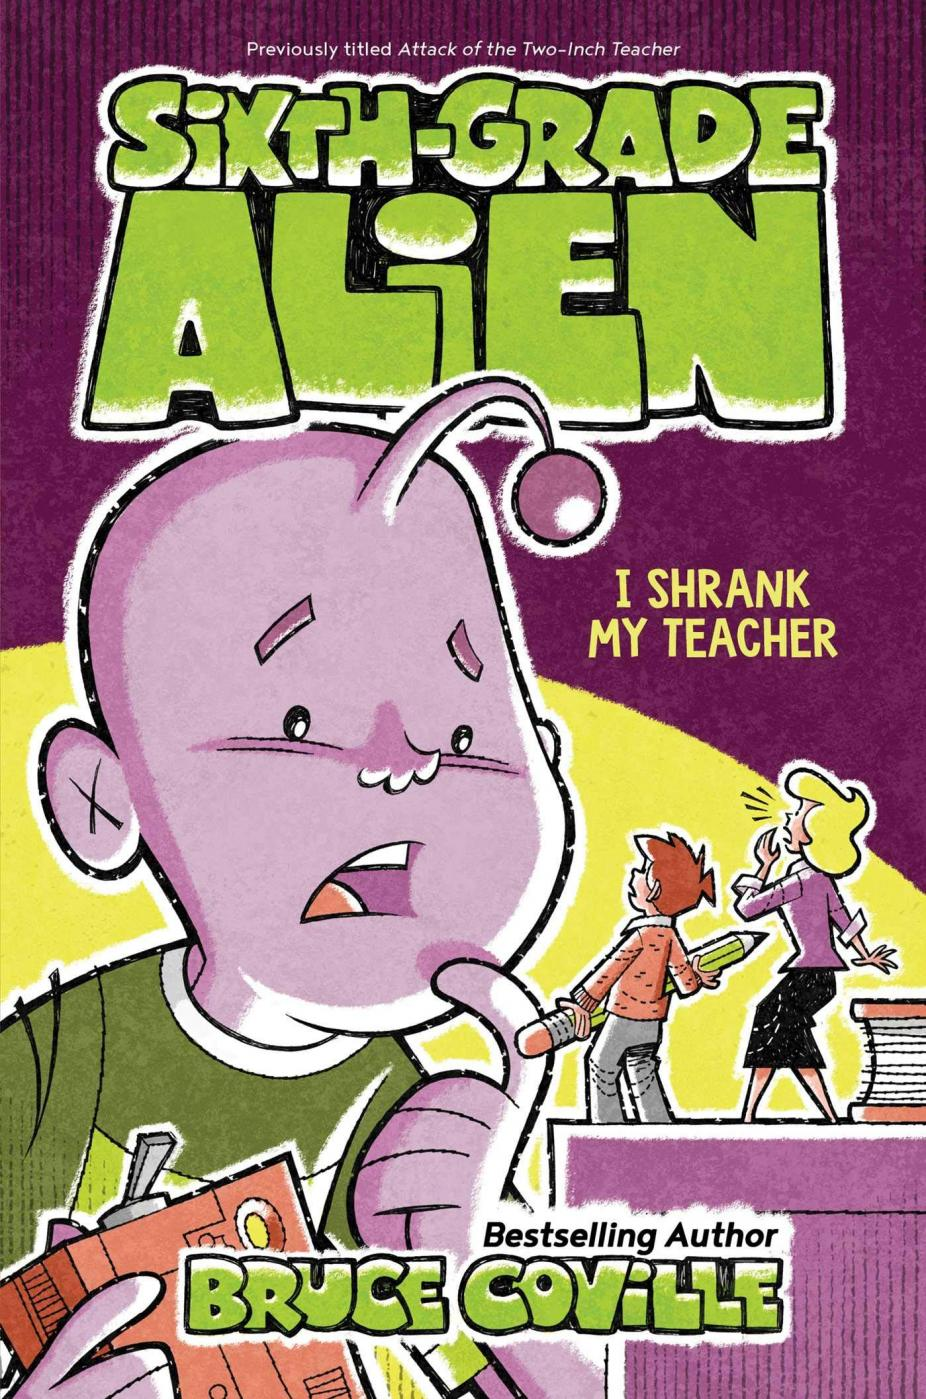 I shrank my teacher